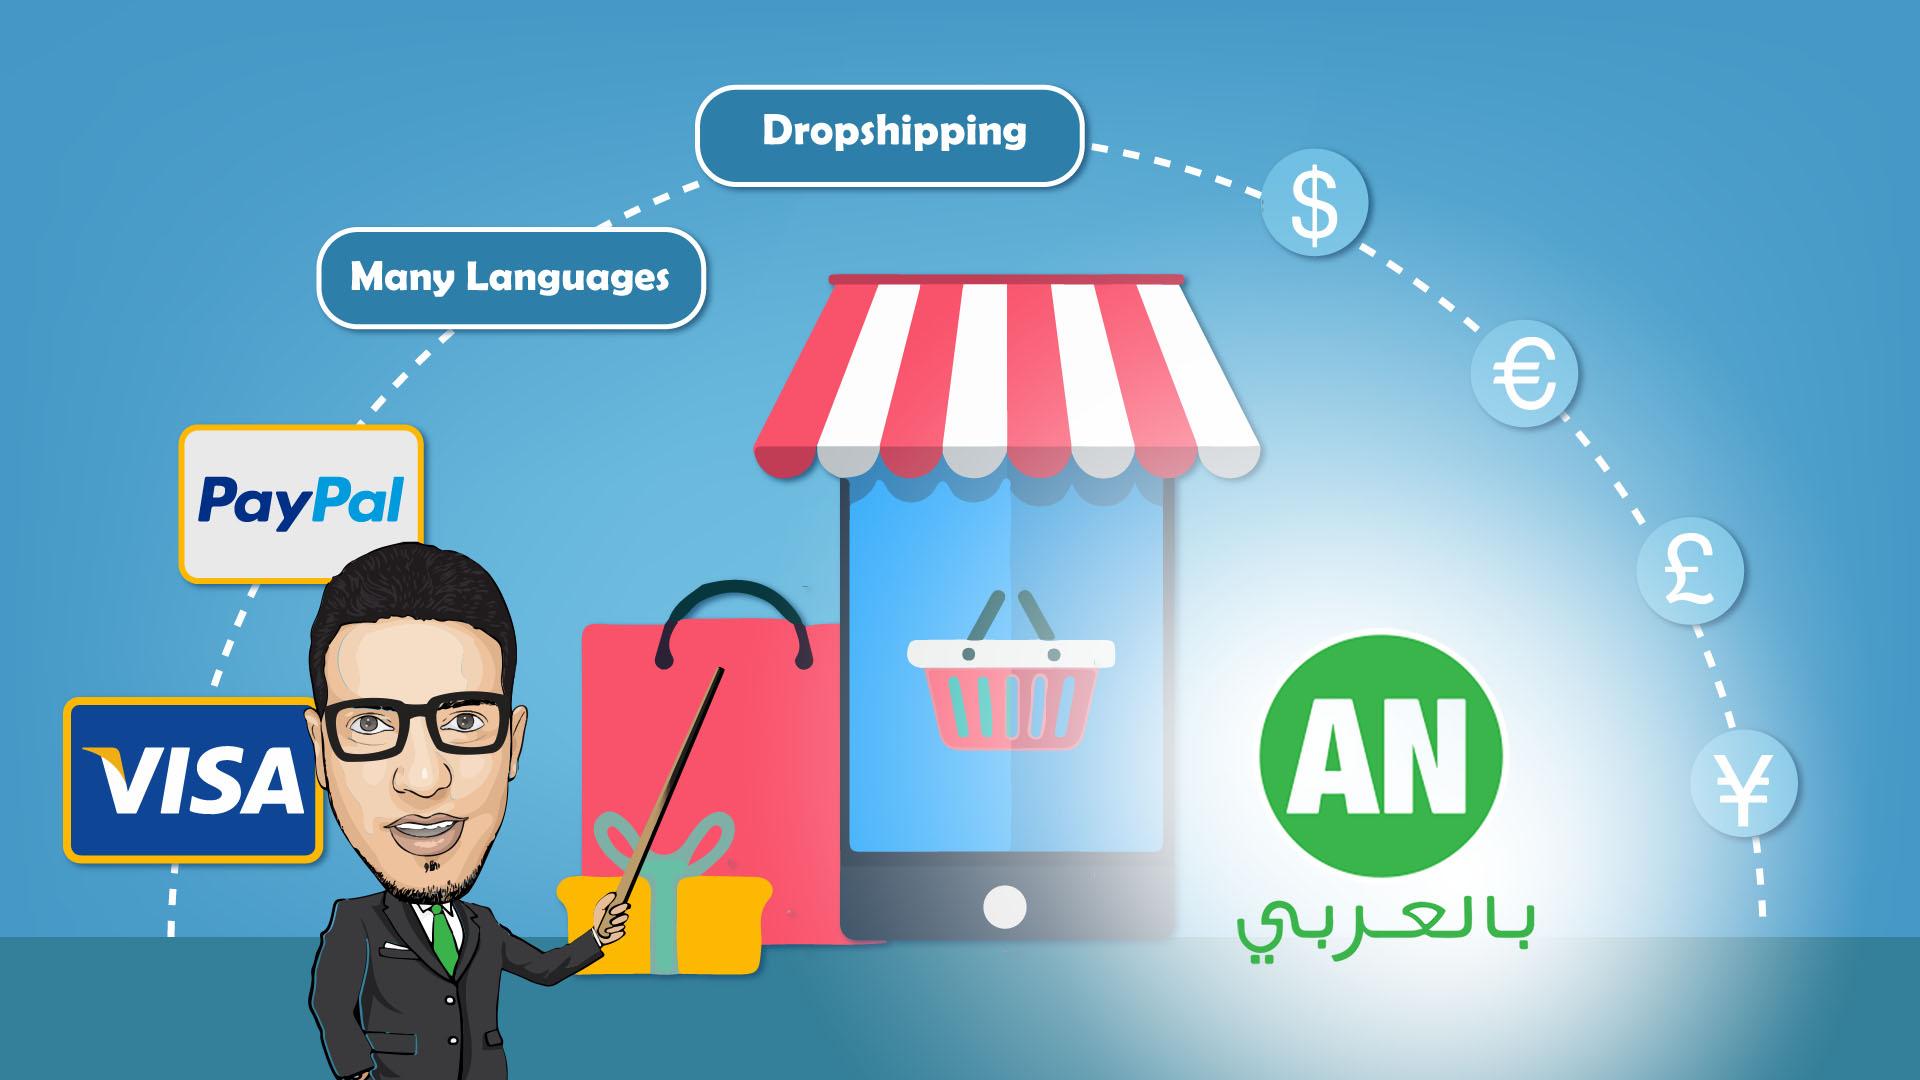 Photo of عمل متجر الكتروني، طرق الدفع فيزا وباي بال، عدة لغات، عدة عملات  dropshipping